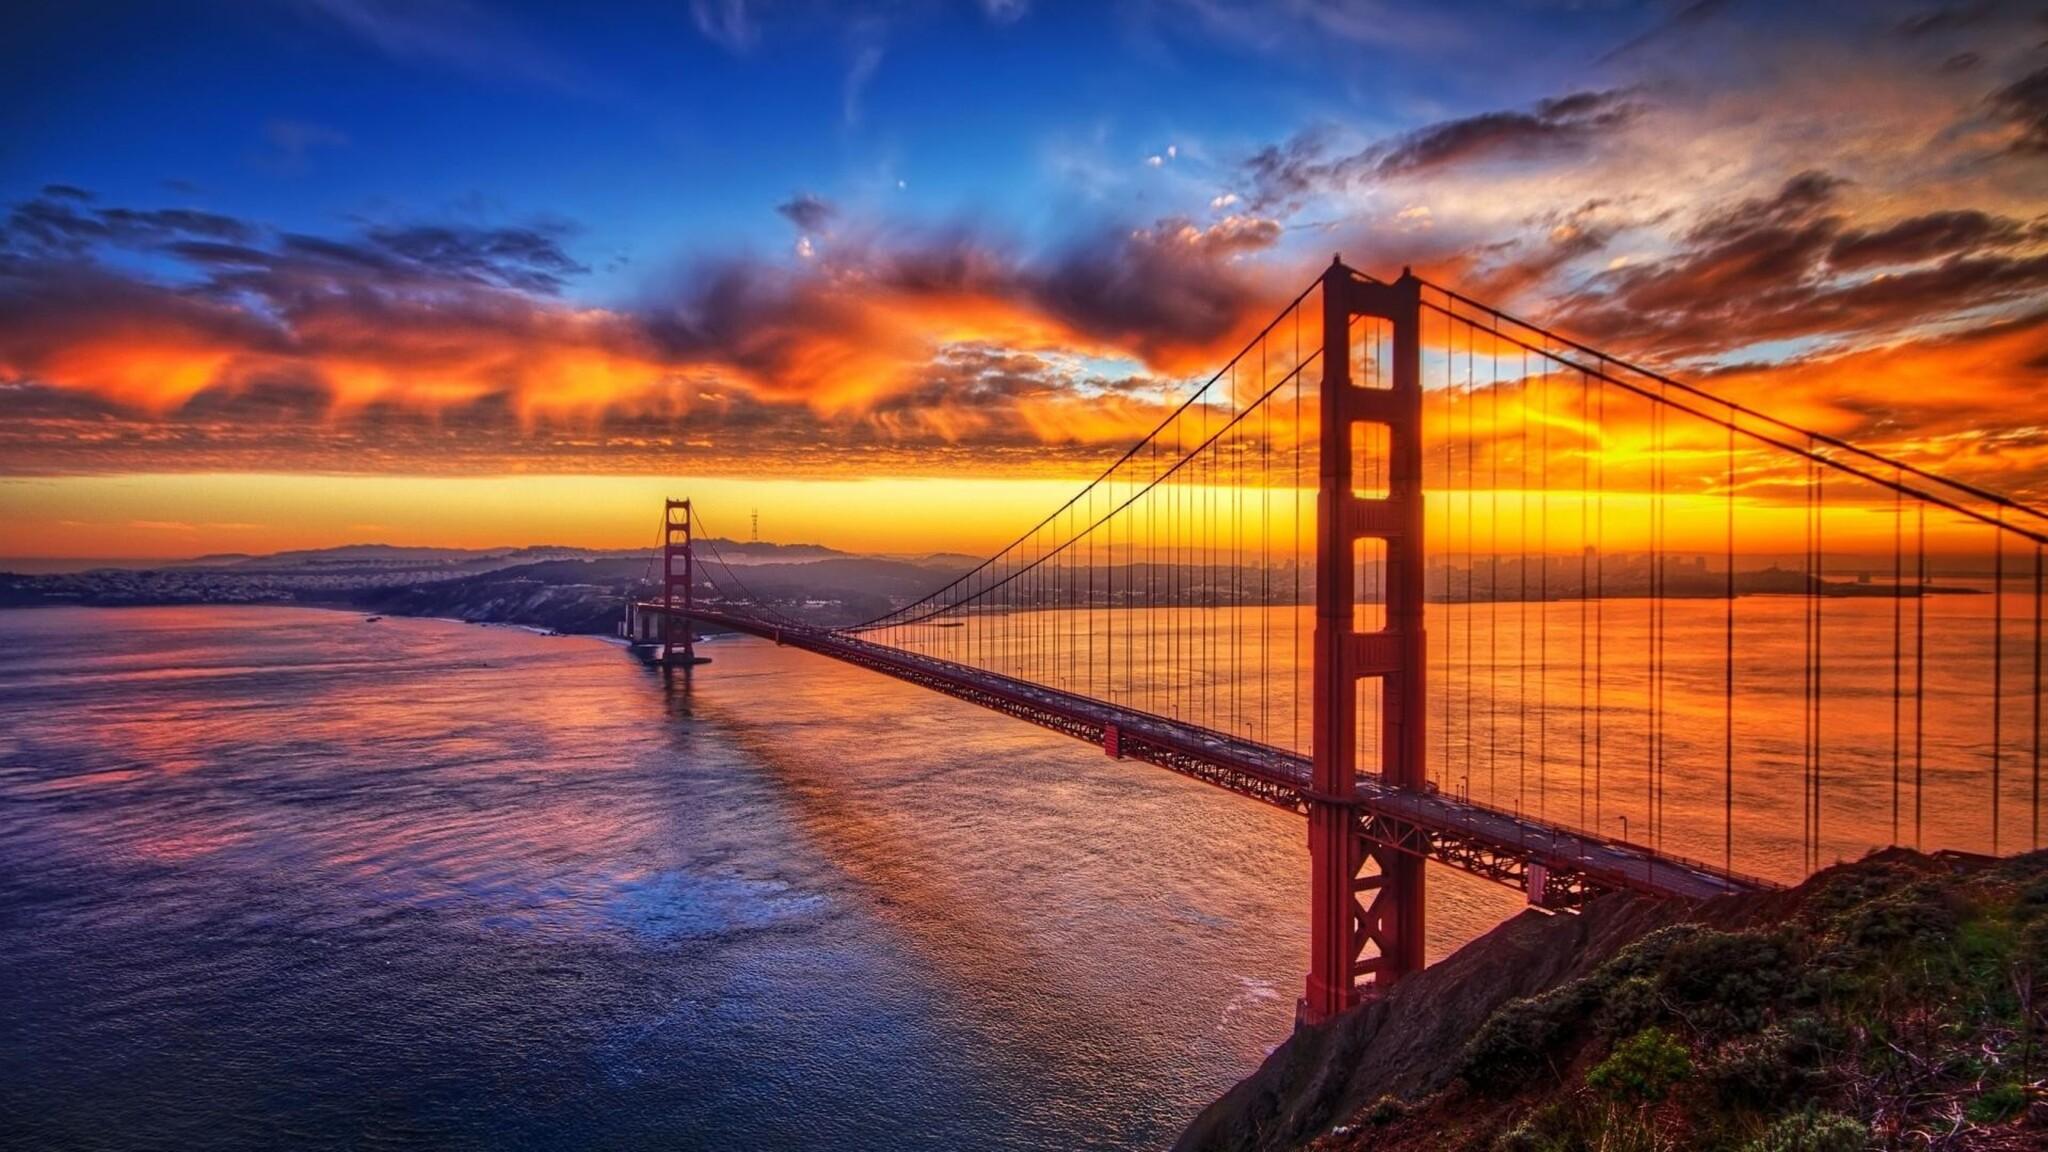 Download Wallpaper 1920x1080 River Sunset Bridge: 2048x1152 Bridge Sunset Sky 2048x1152 Resolution HD 4k